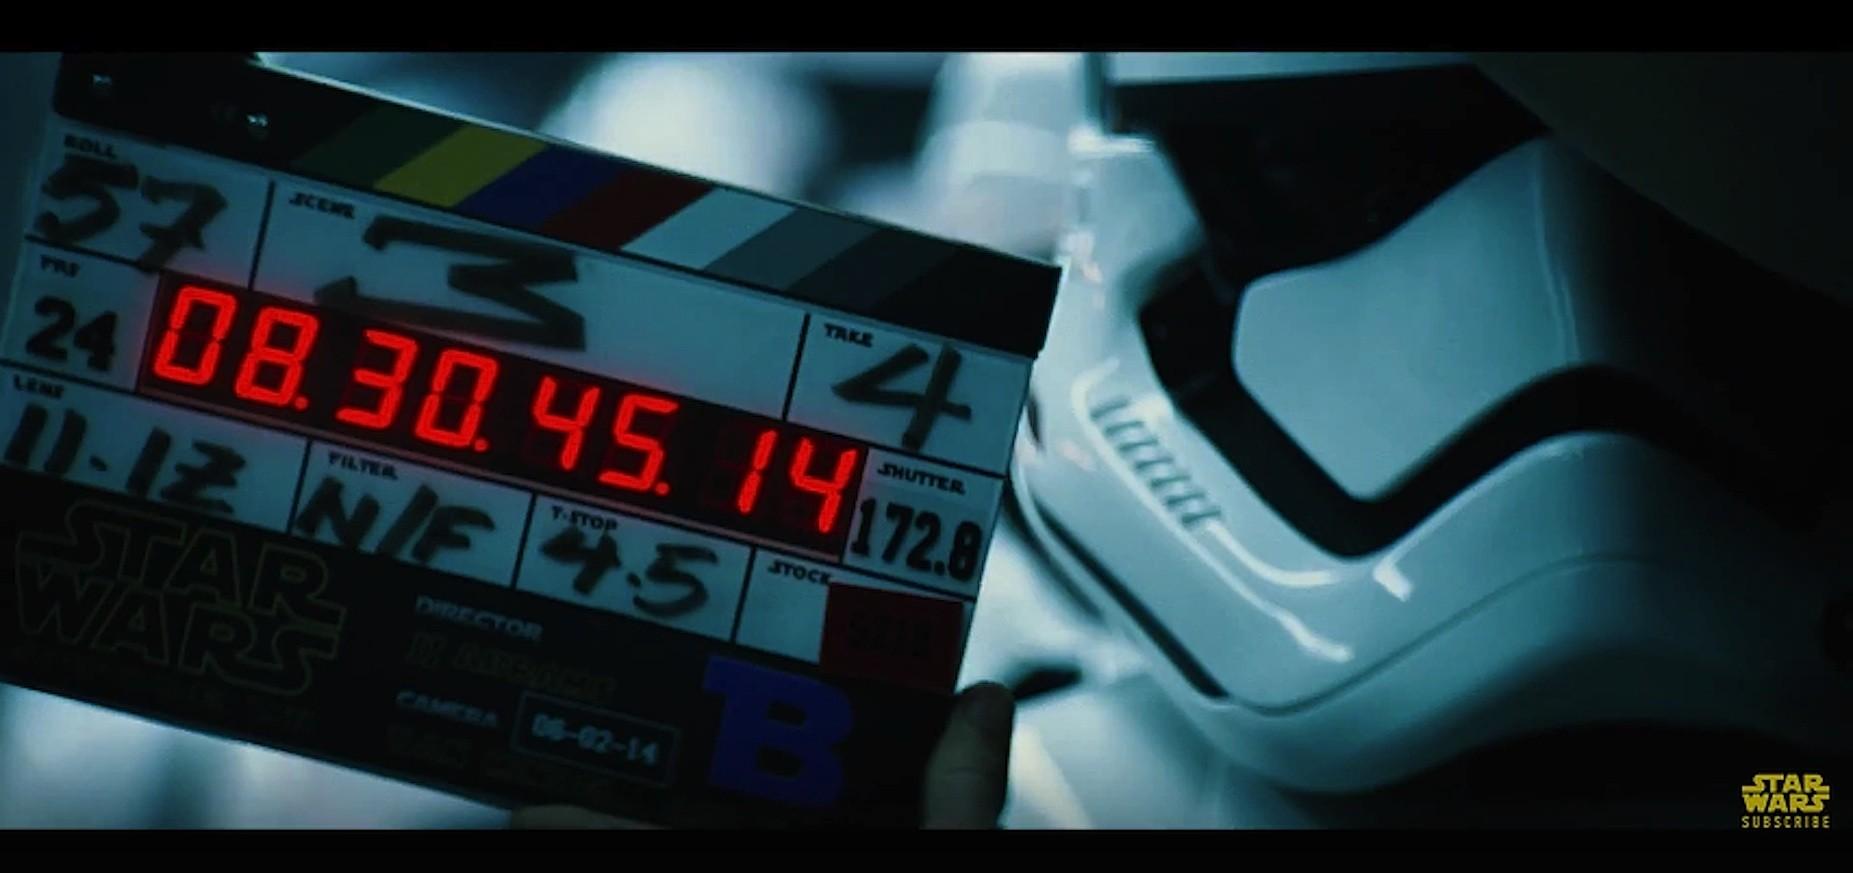 Phoenix James - Star Wars Episode VII - The Force Awakens - Behind the Scenes